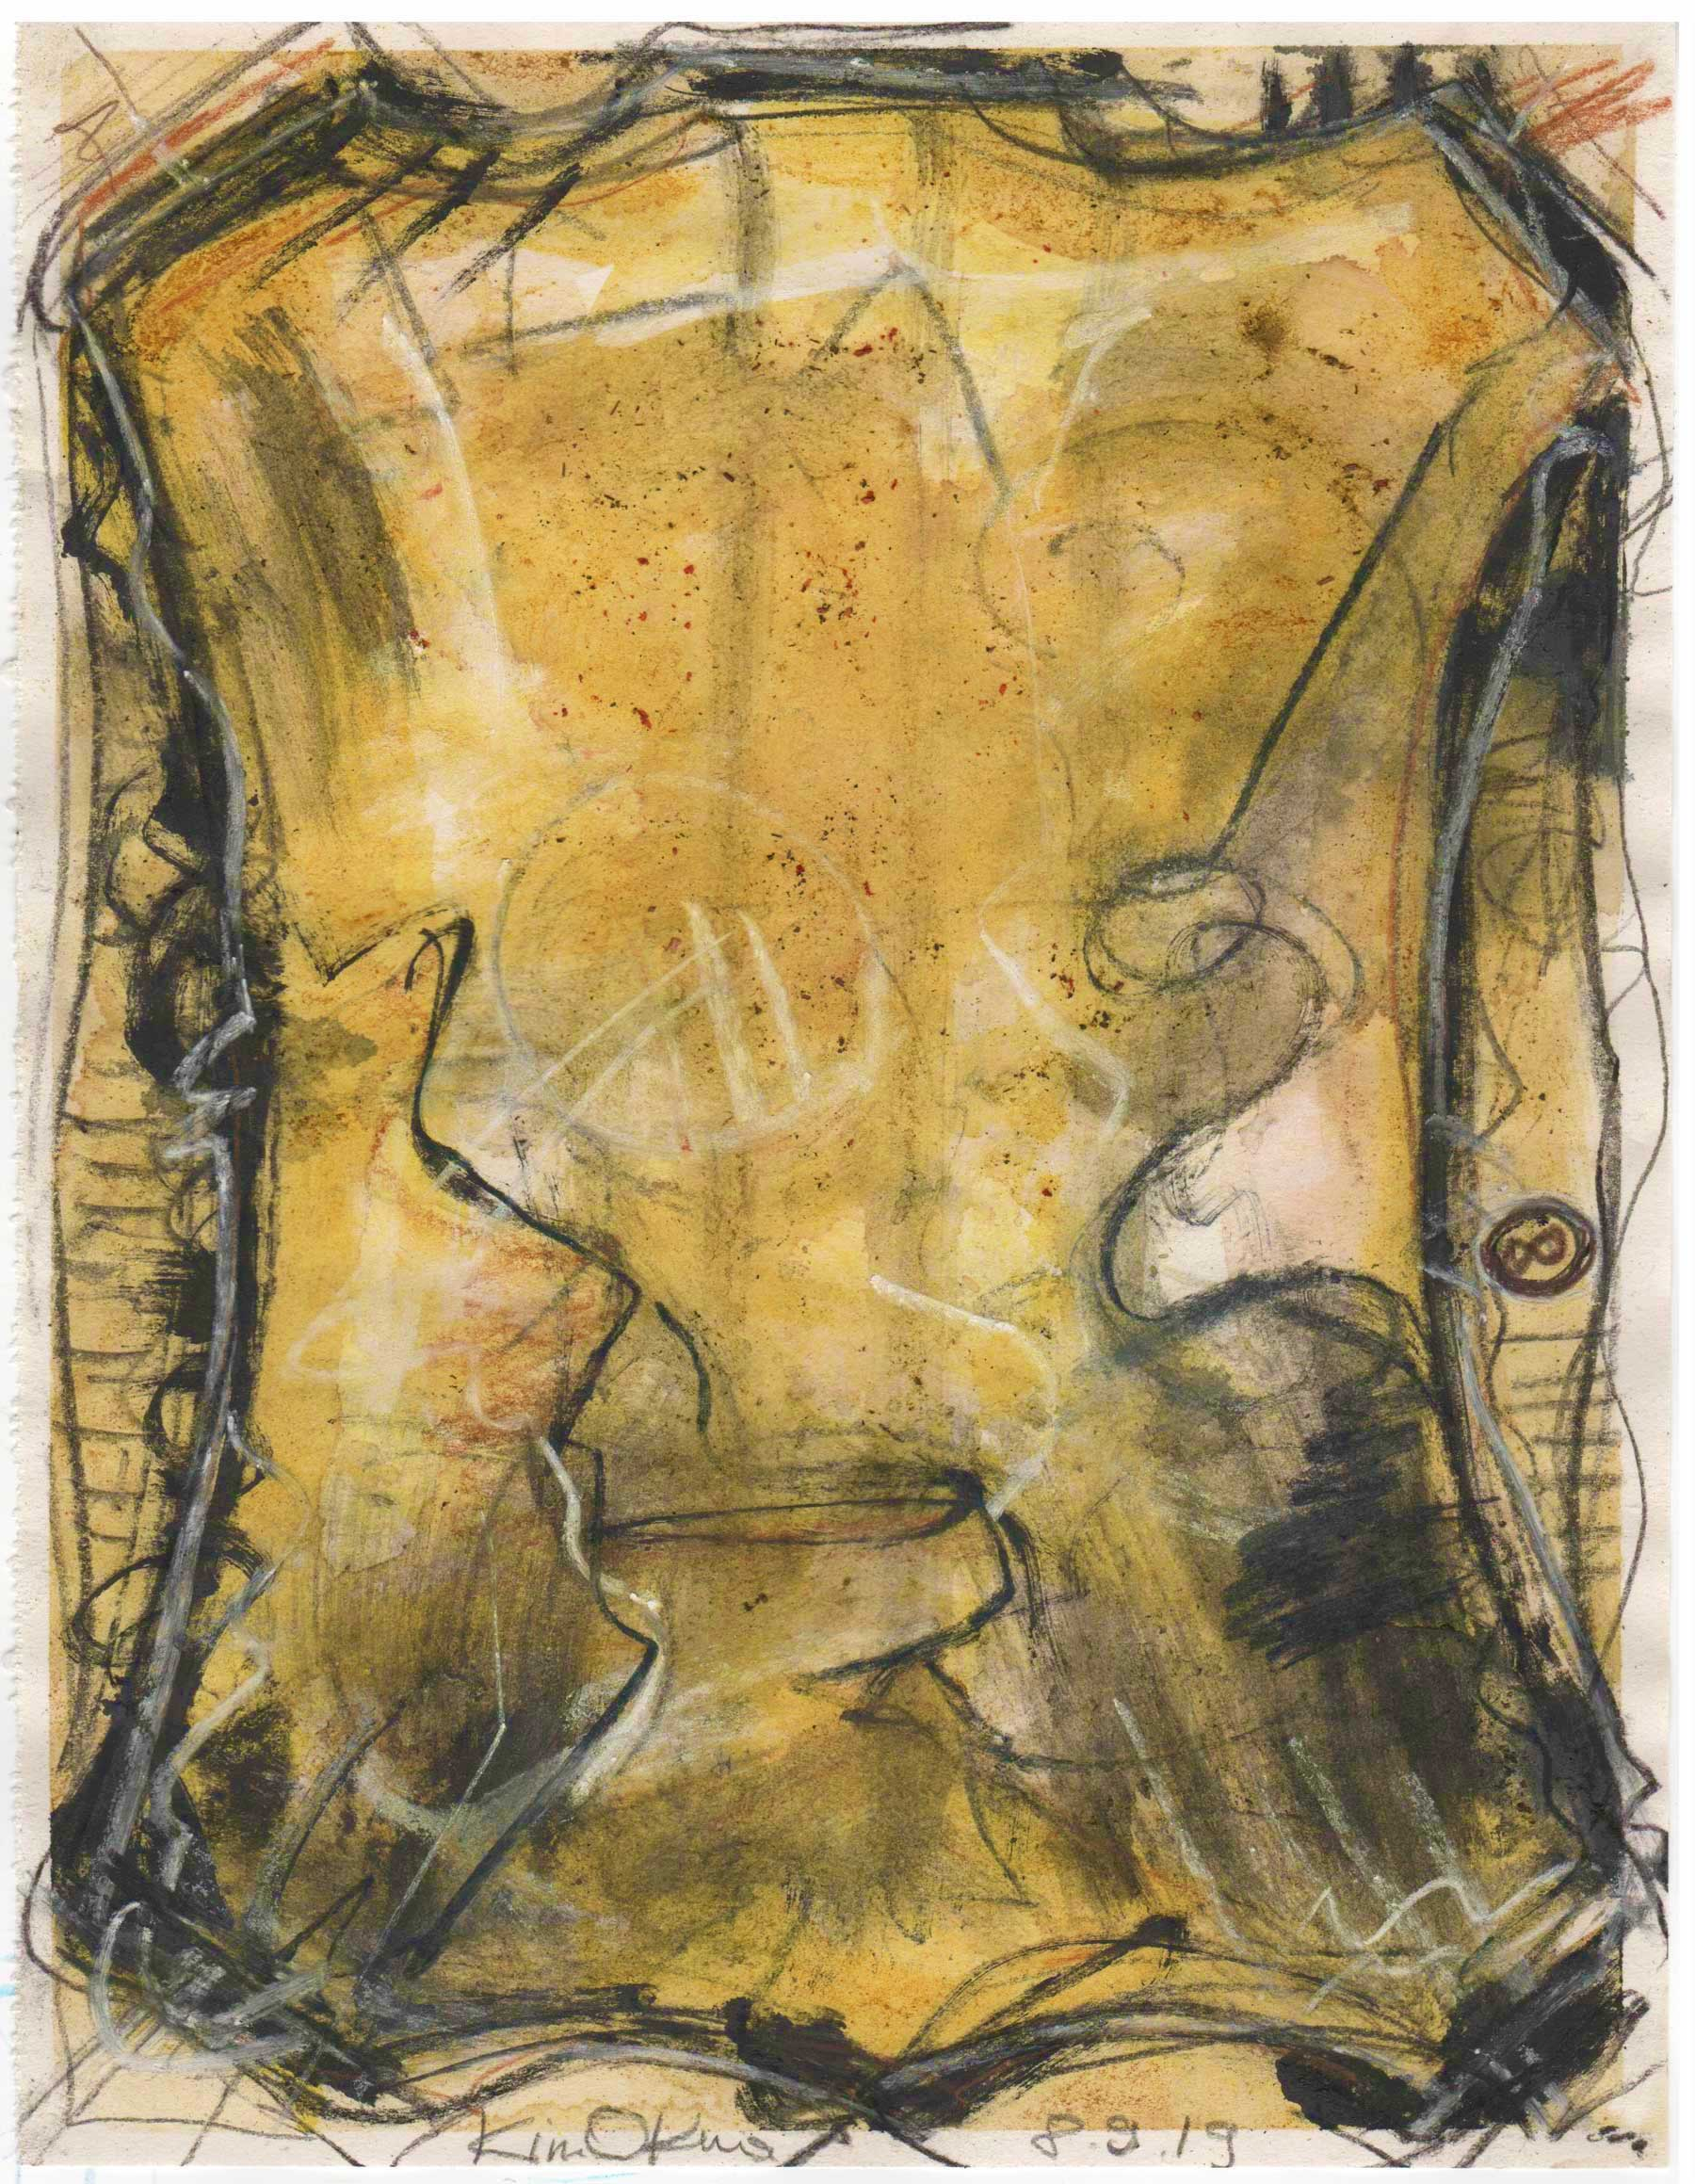 Kim Okura painting joytrophie